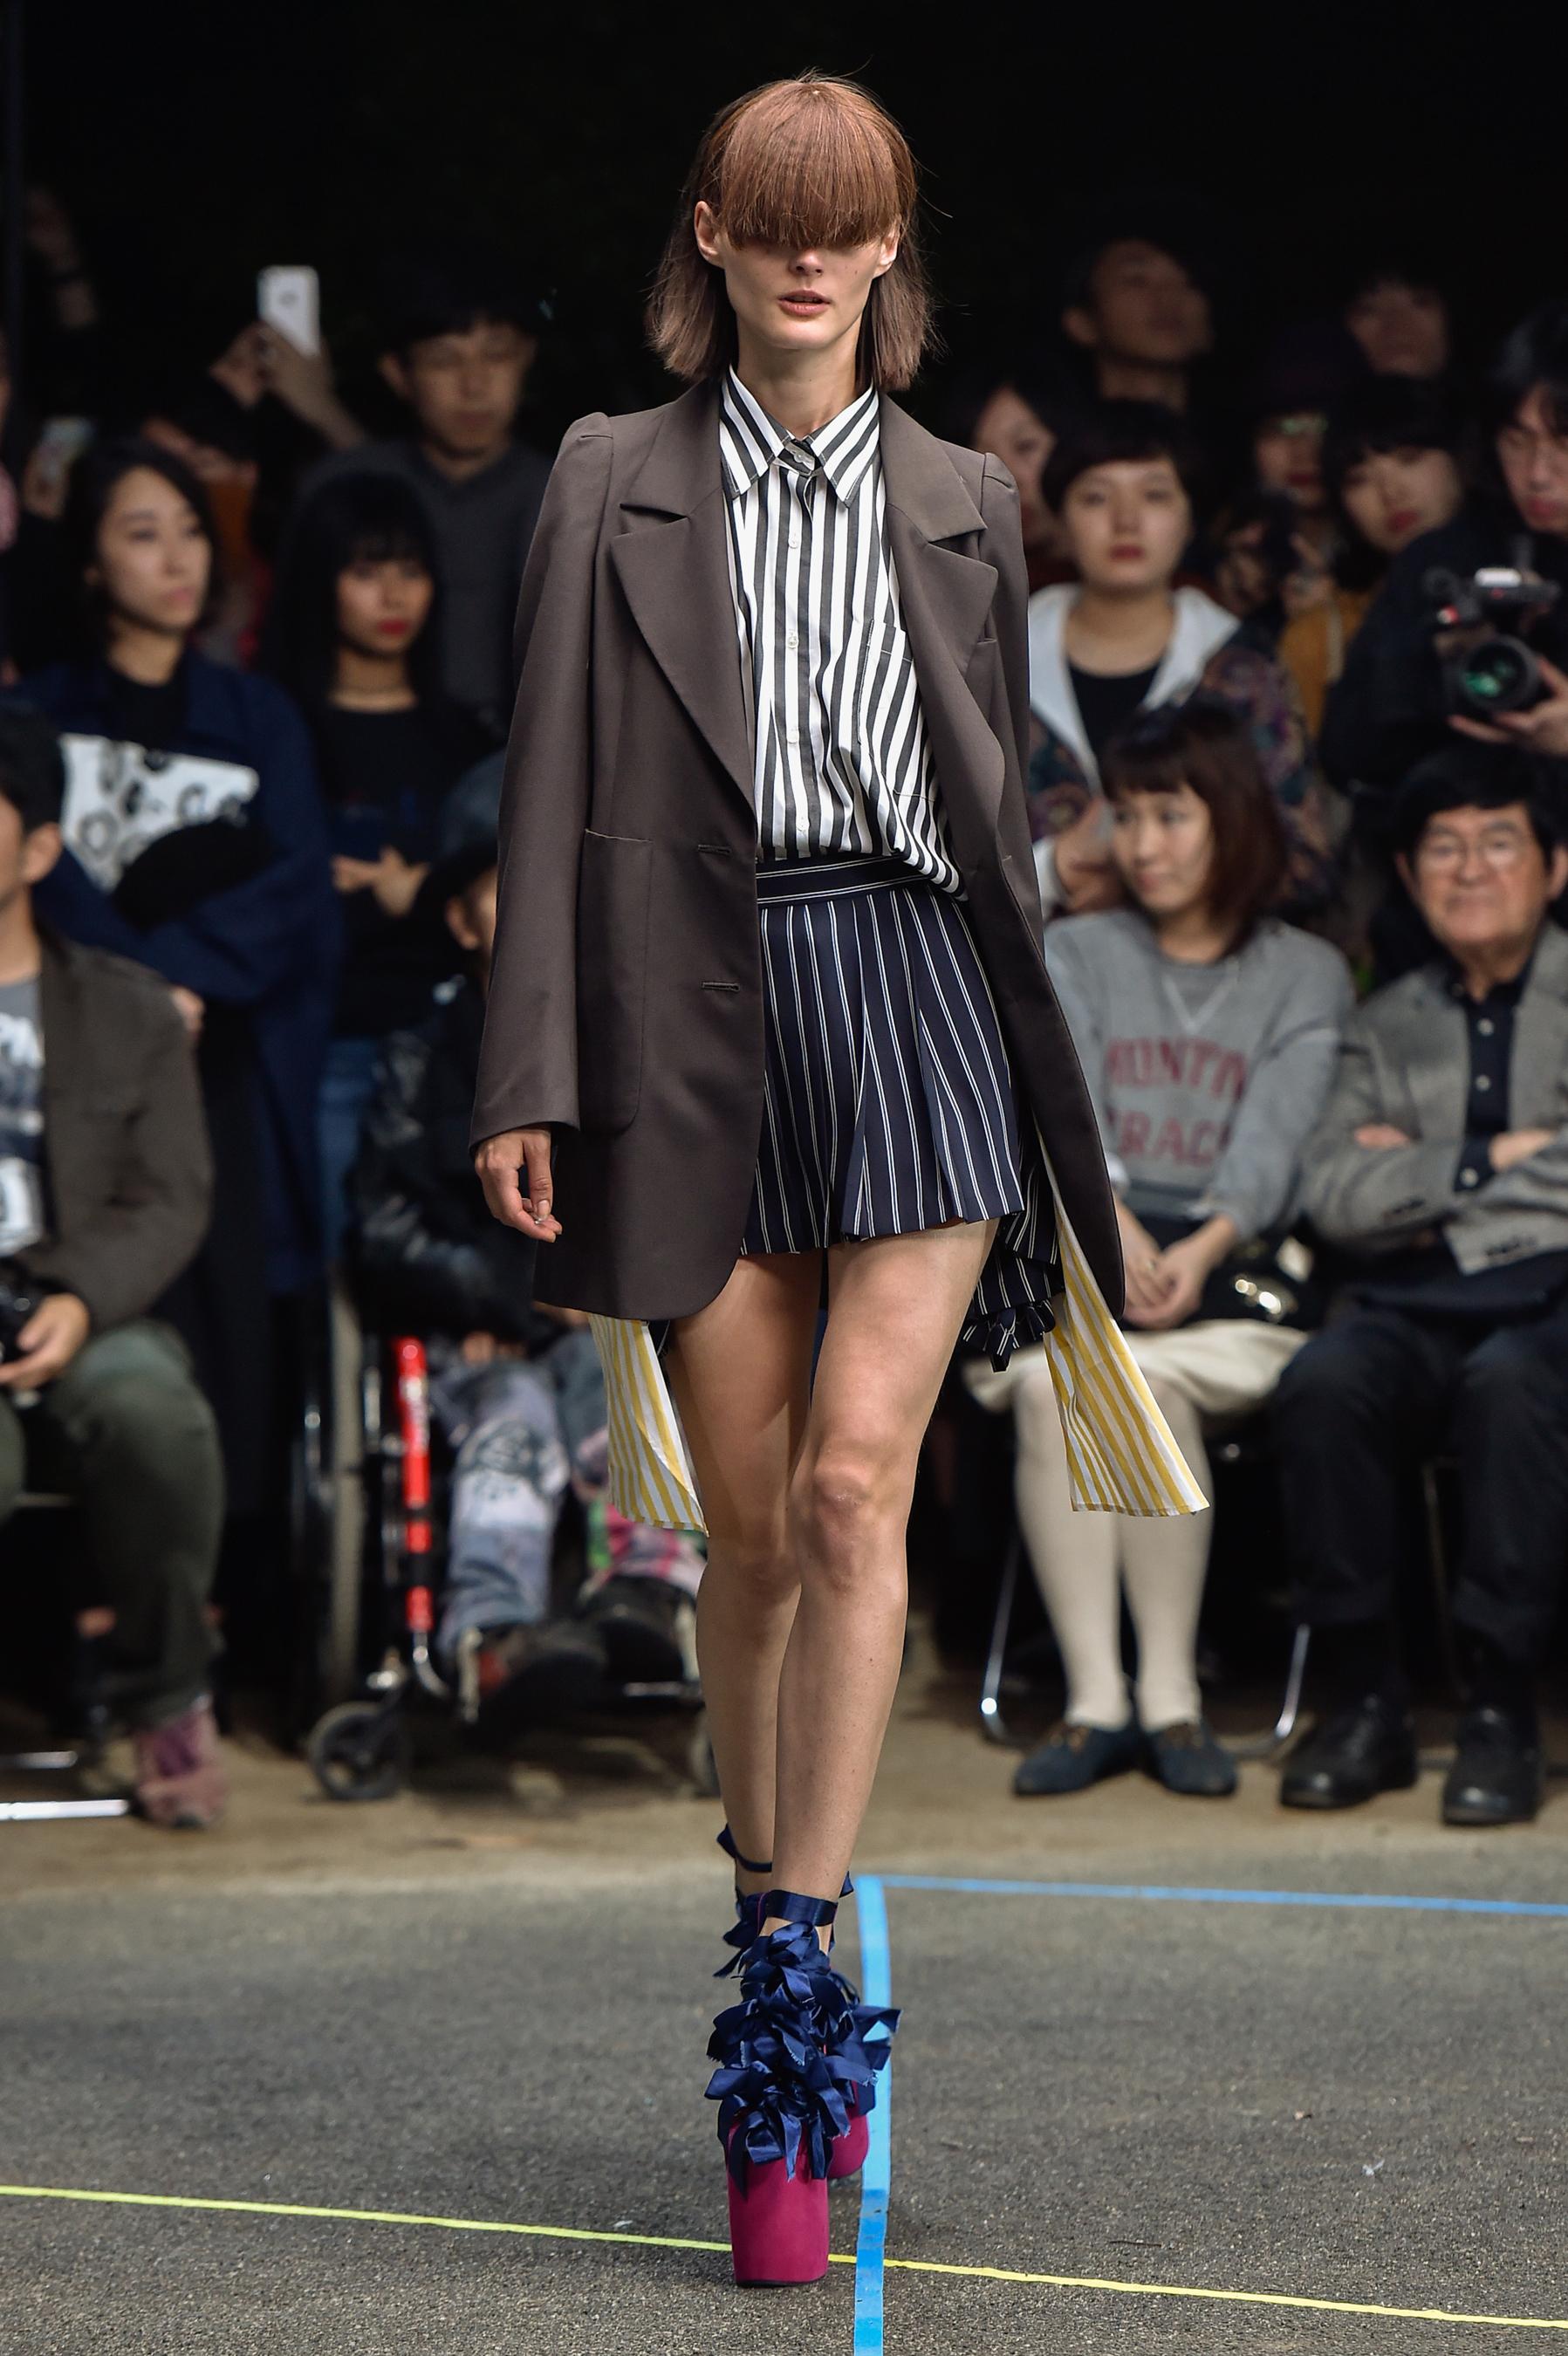 Mikio Sakabe RS17 023